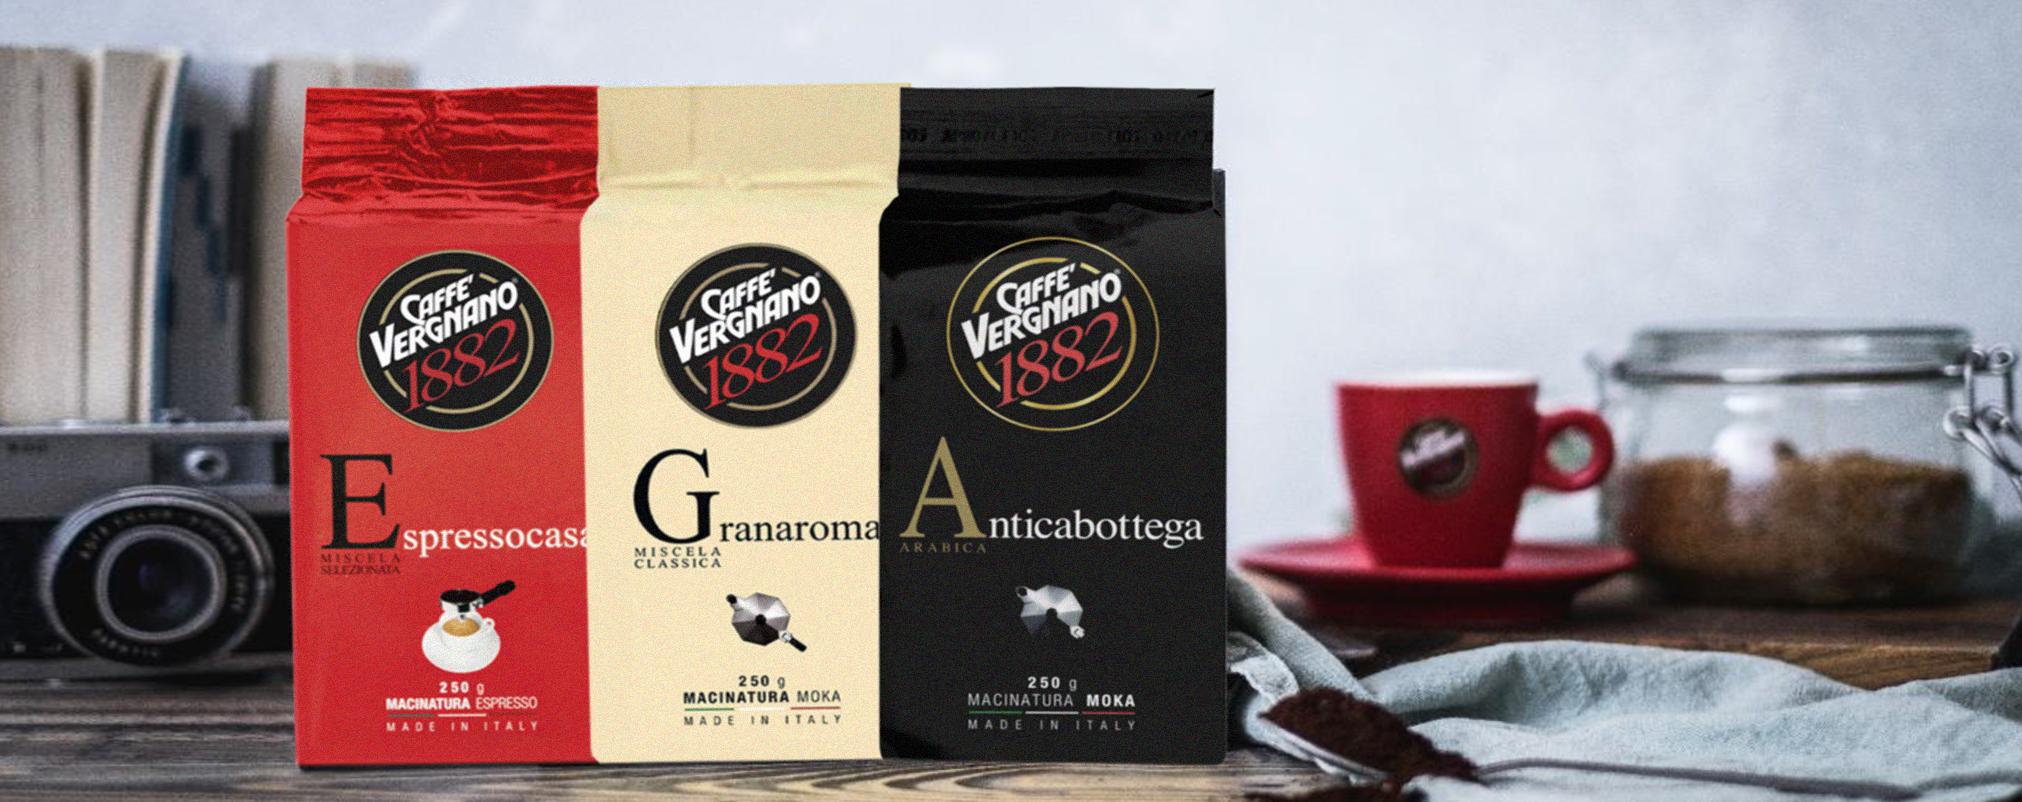 Caffè Vergnano - Institutional 2017